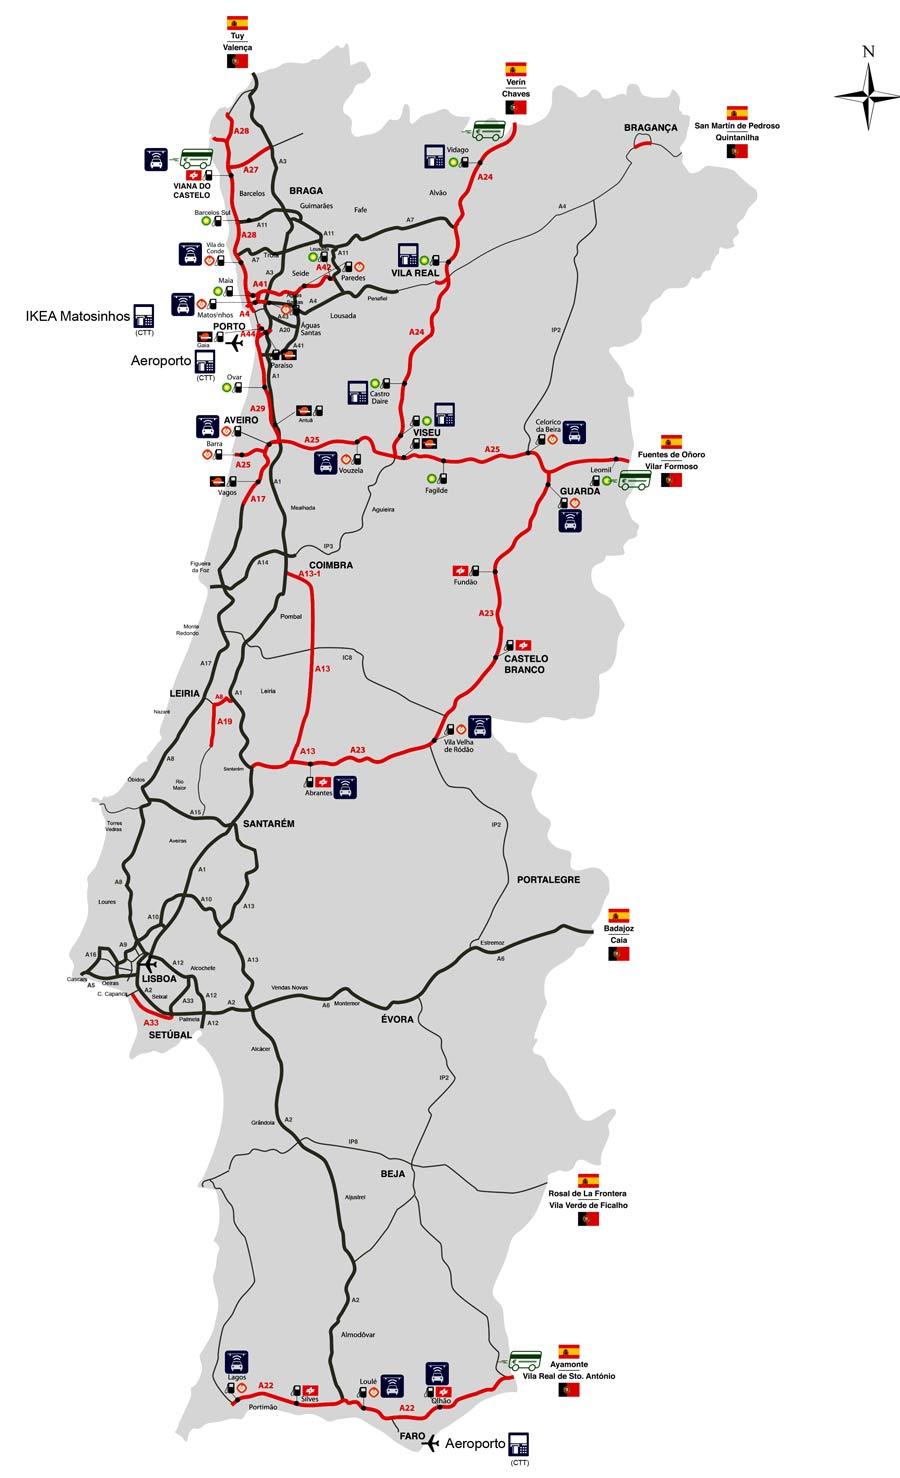 Peajes En Portugal Mega Guia 2020 100 Dudas Resueltas